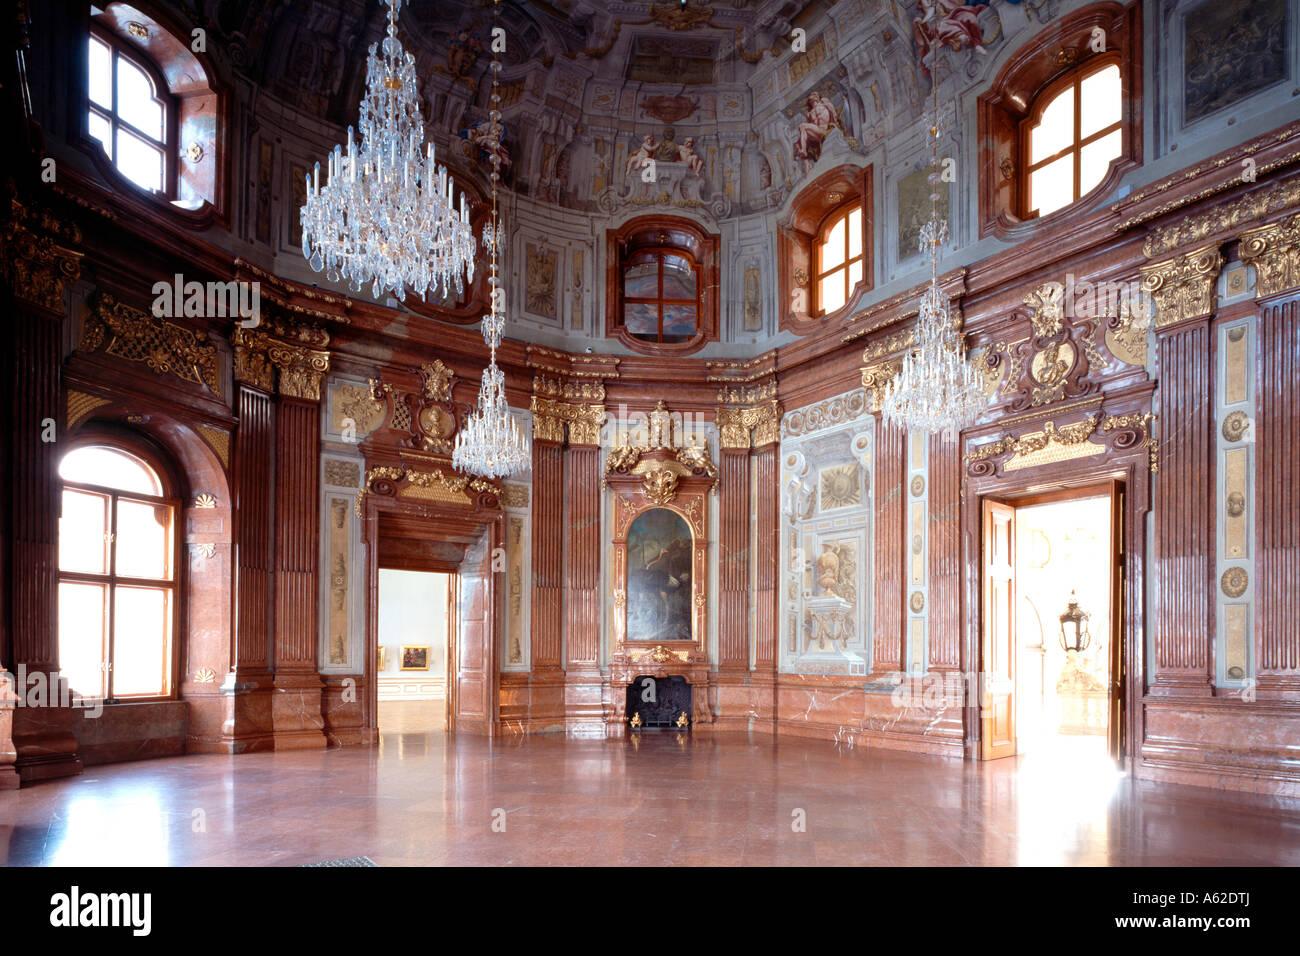 Wien Oberes Belvedere Marmorsaal Stock Photo Royalty